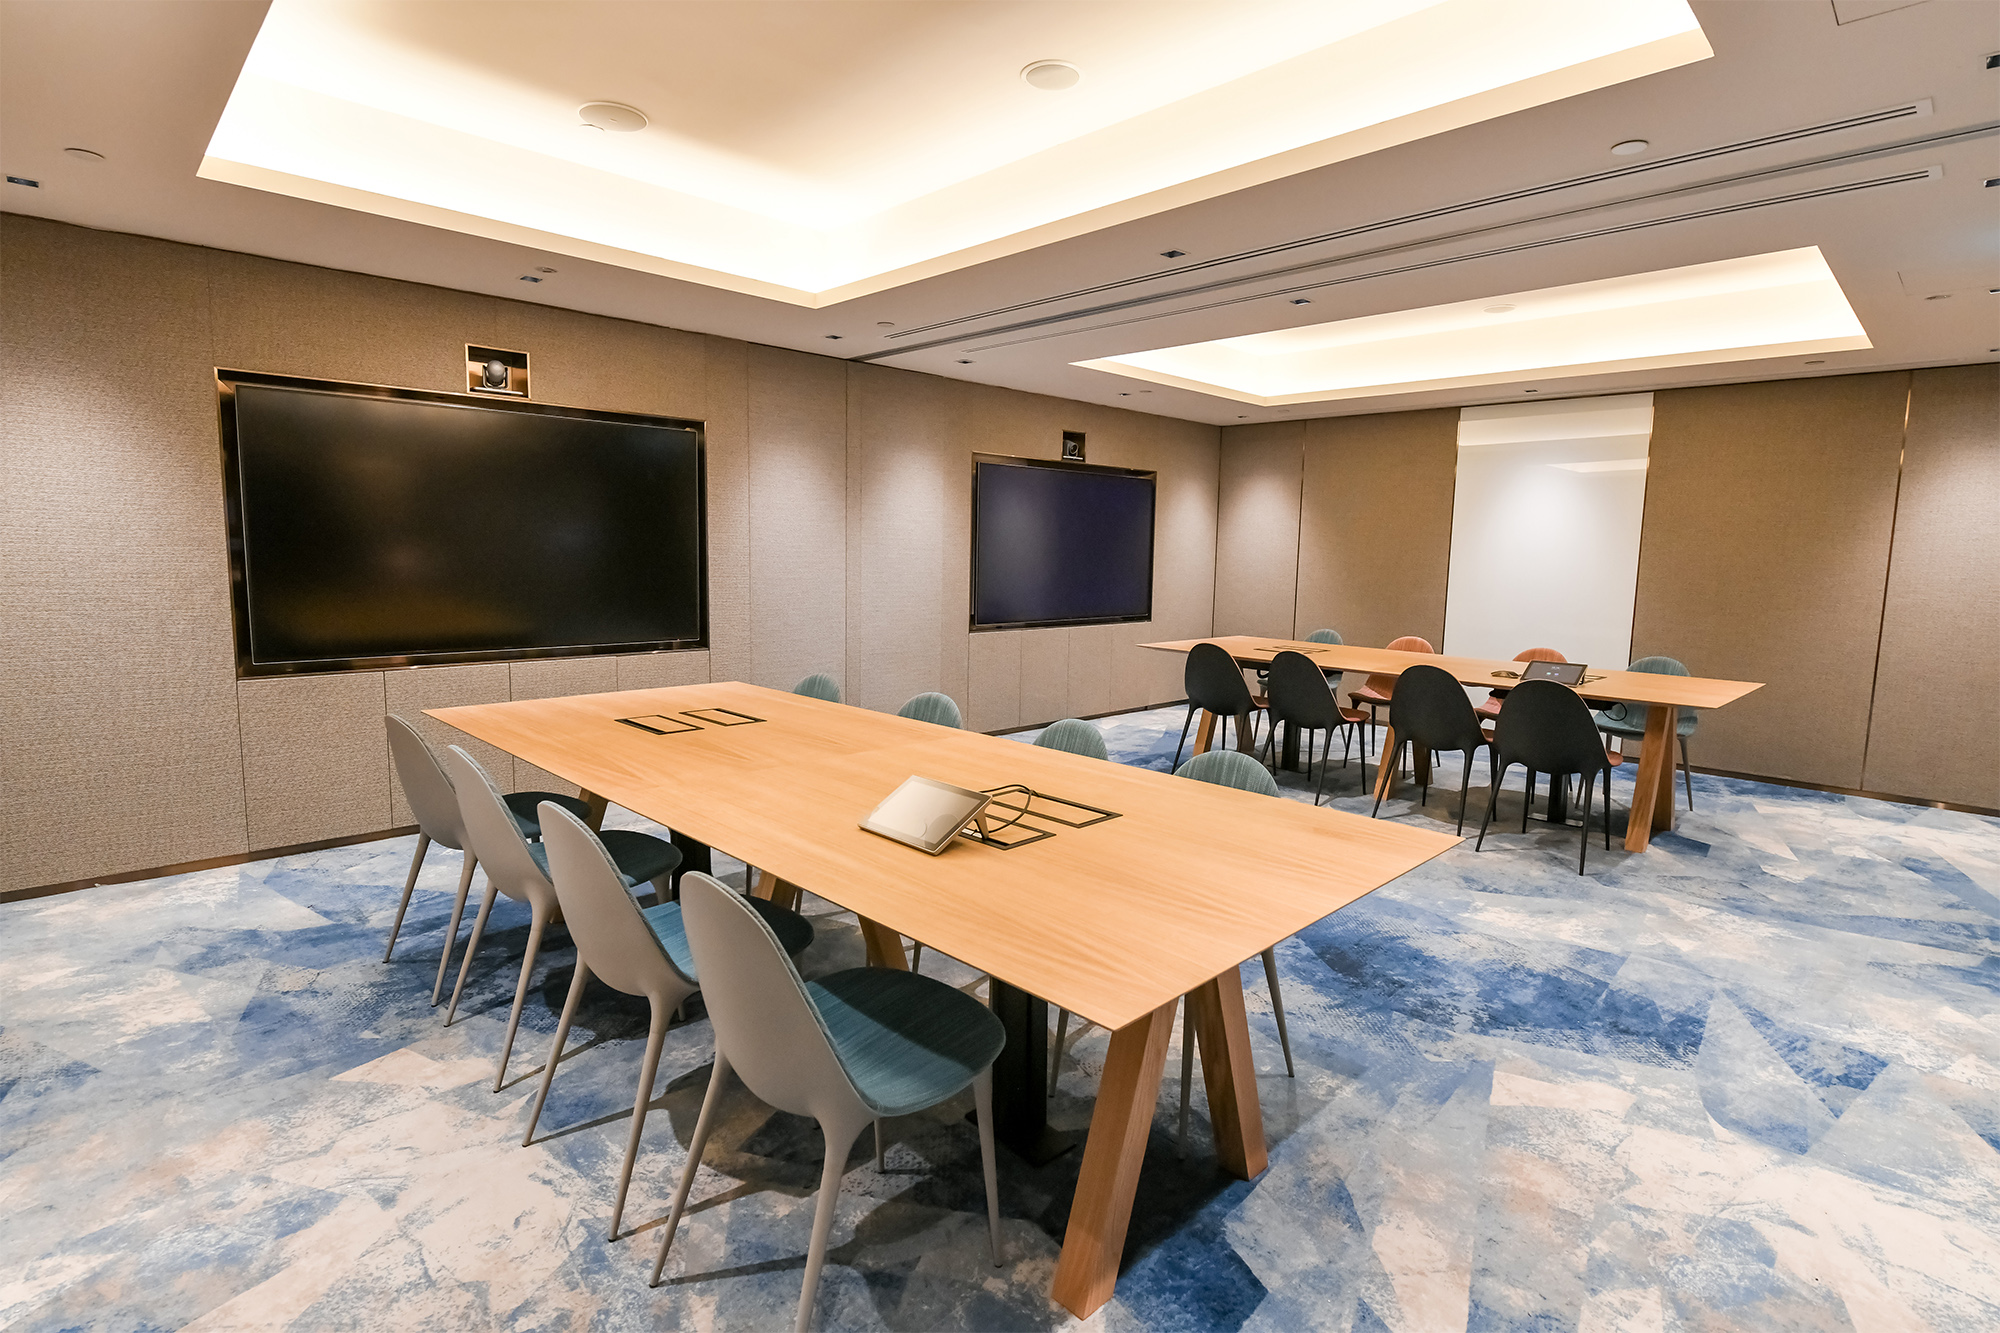 Meeting Room (Changi Airport Group).jpg